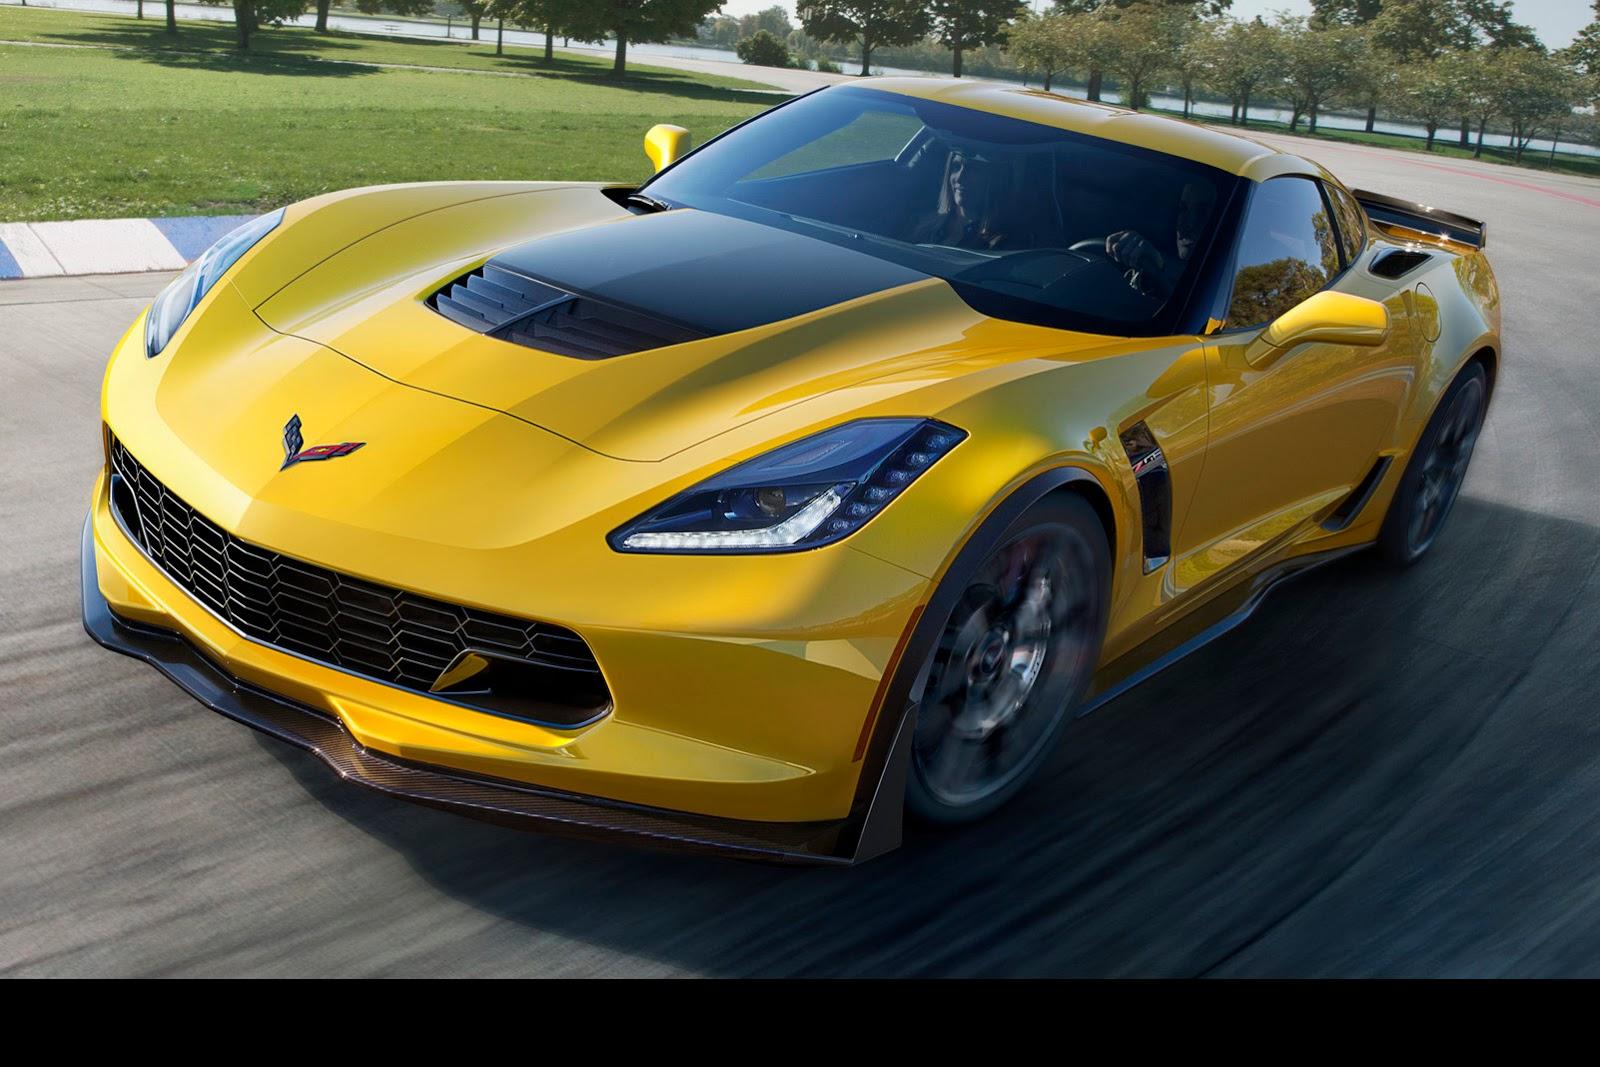 2015 chevrolet corvette z06 oficially reveiled american muscle car guide. Black Bedroom Furniture Sets. Home Design Ideas